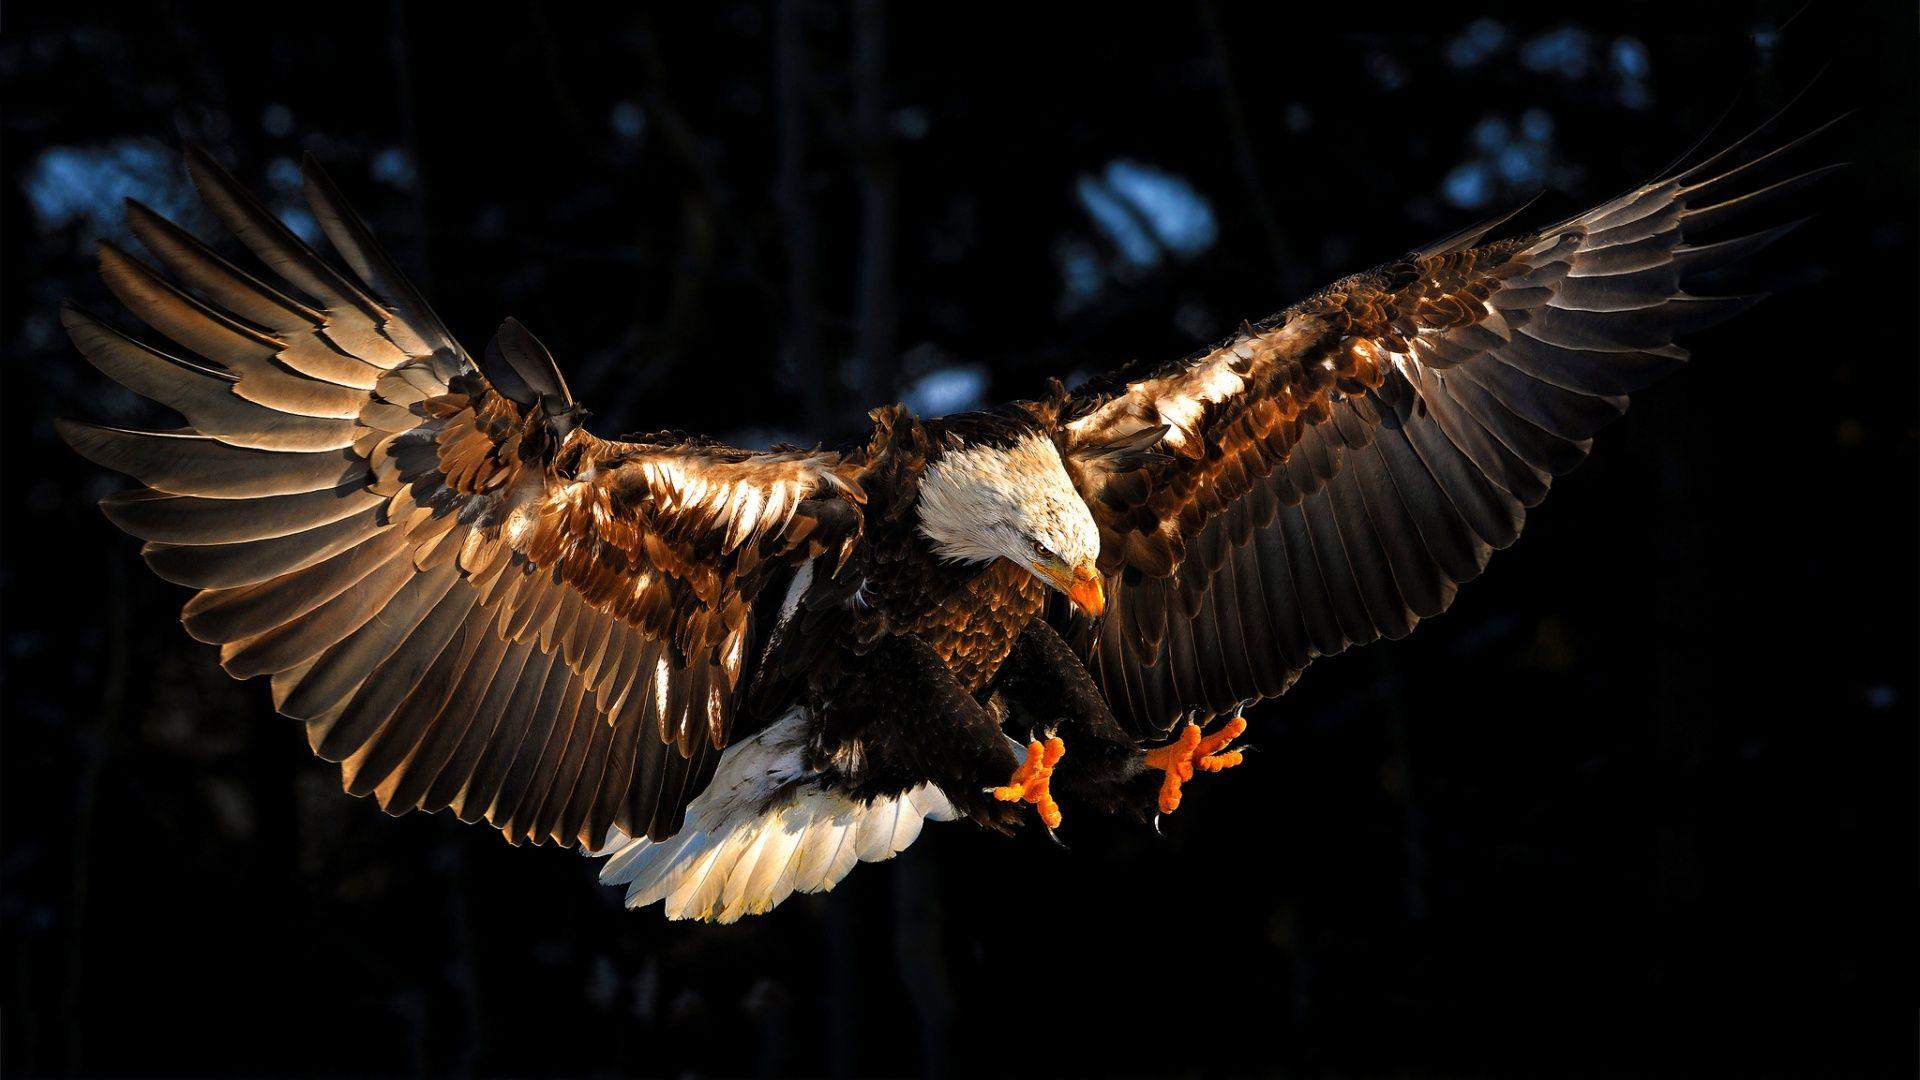 My Feed Eagle Wallpaper Eagle Images Bald Eagle 1080p eagle images hd wallpaper download